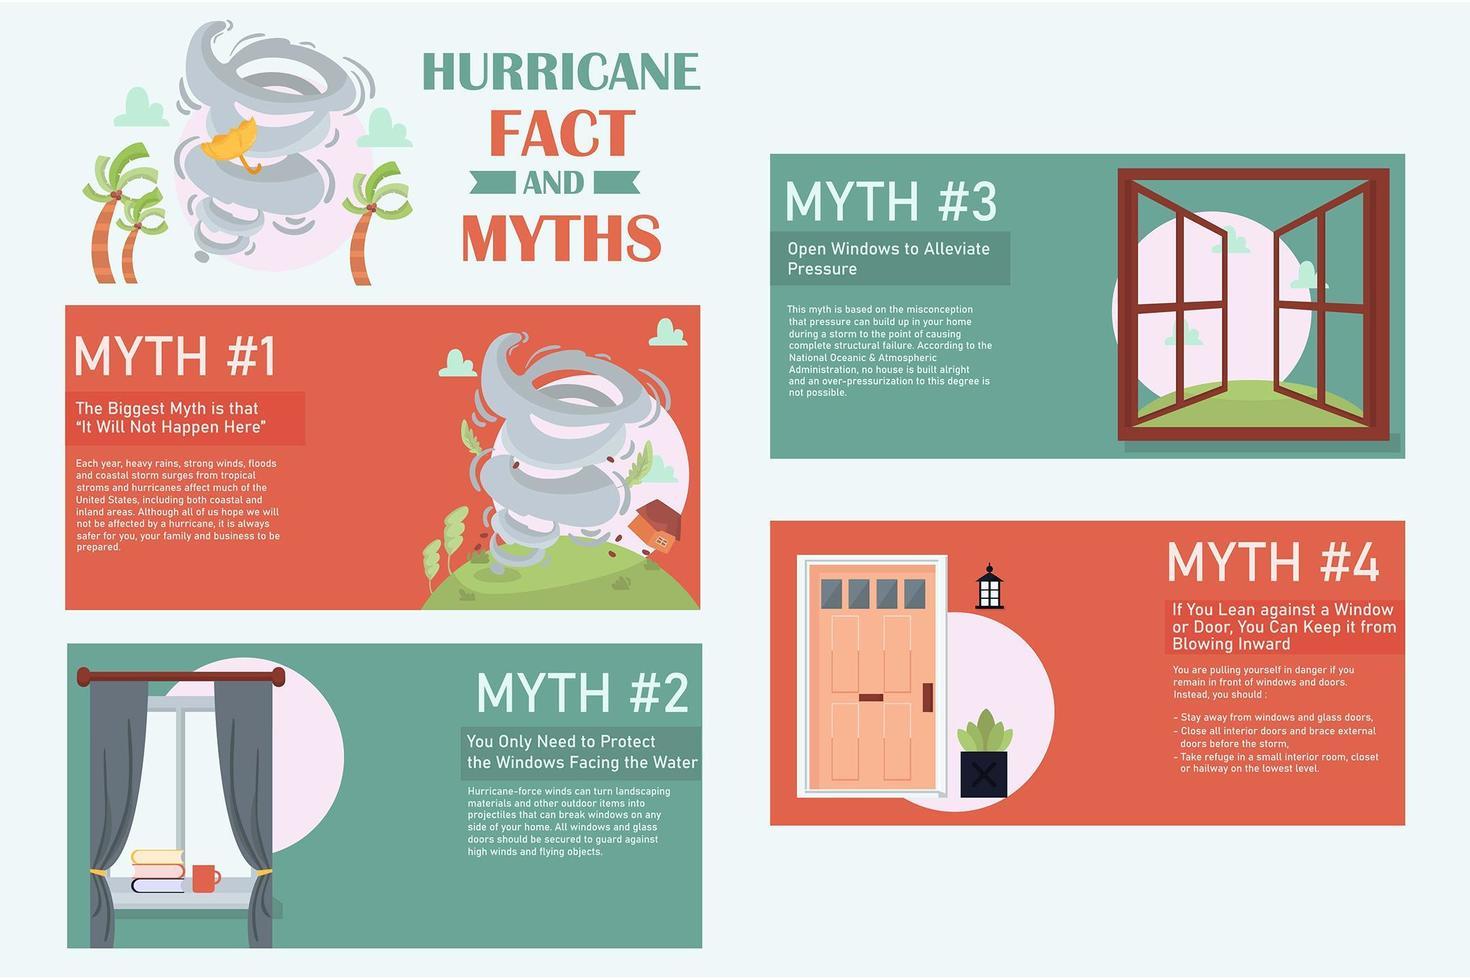 Hurrikan Fakten und Mythen Infografik vektor